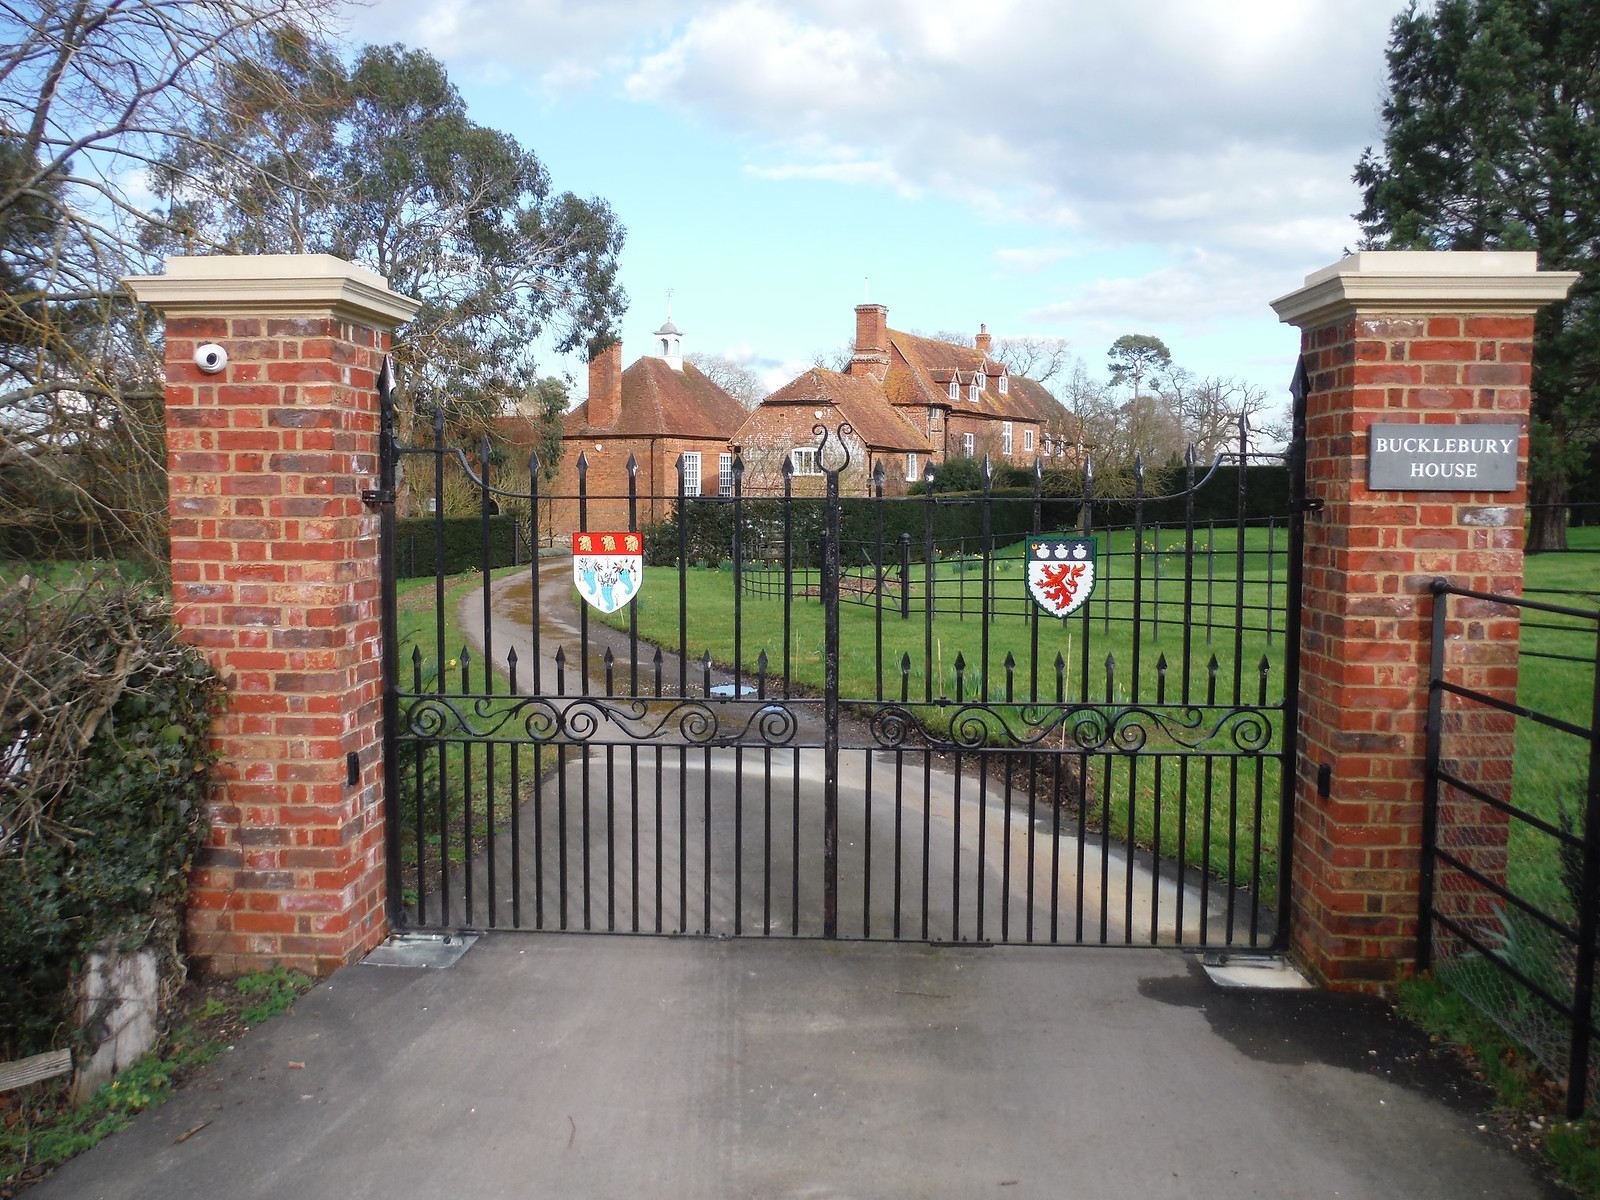 Gate to Bucklebury House SWC Walk 117 Aldermaston to Woolhampton (via Stanford Dingley)